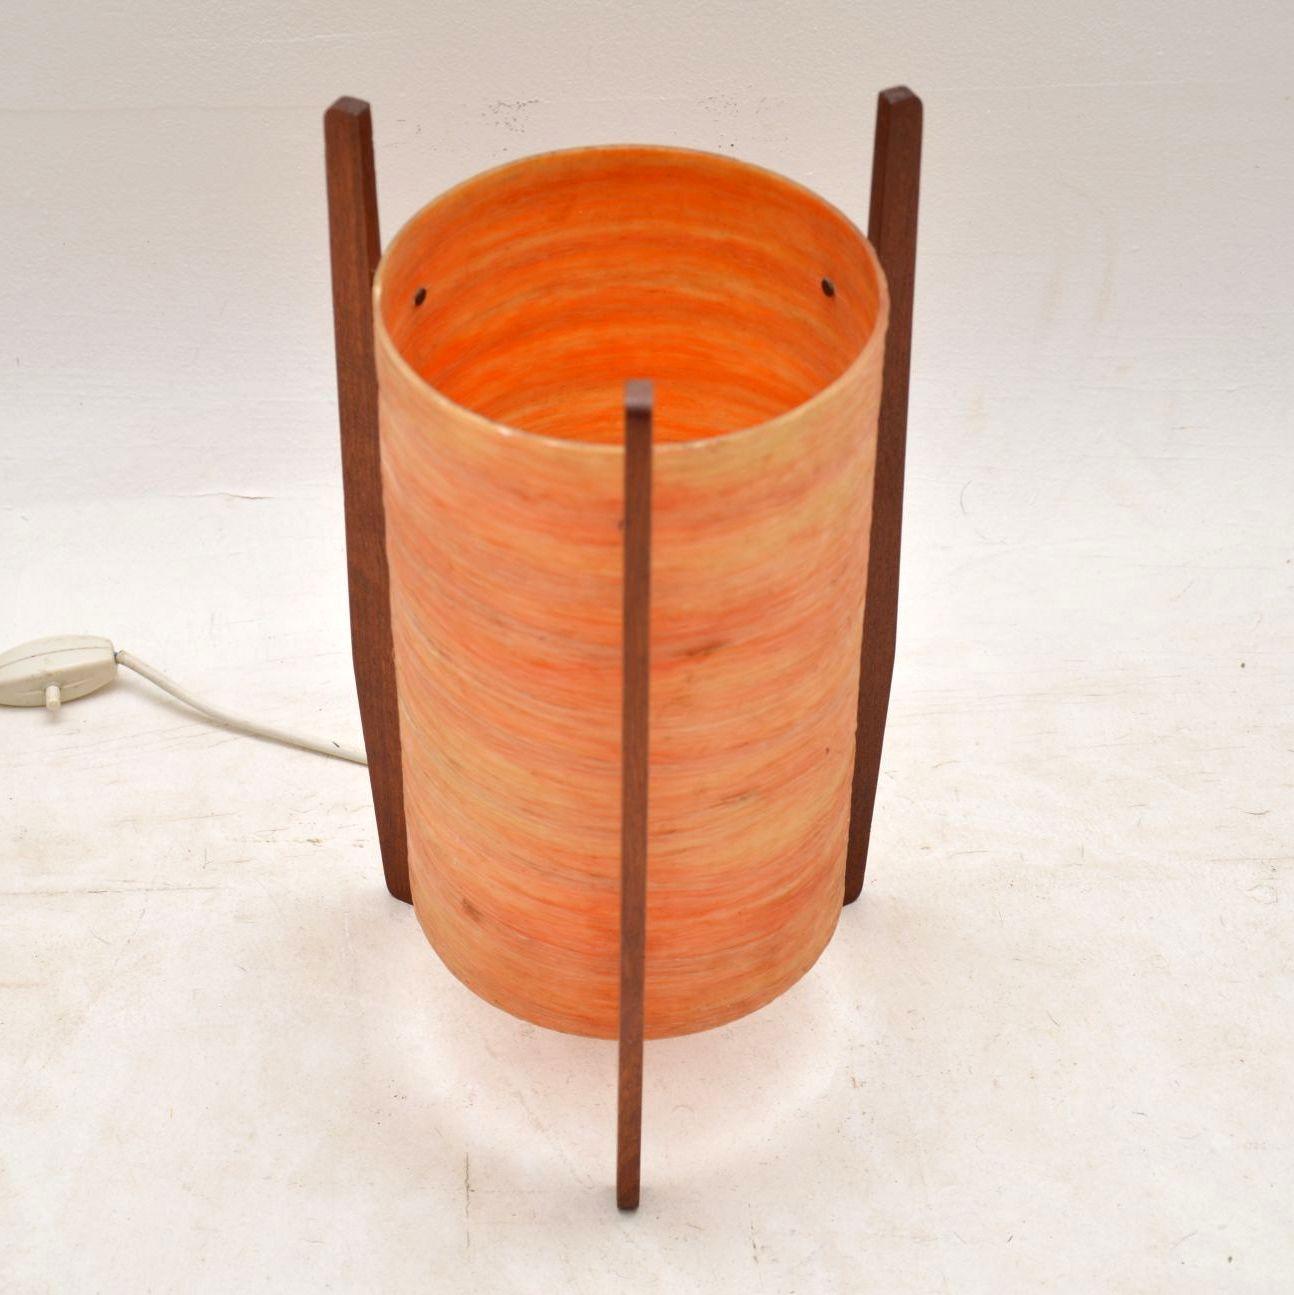 1960's Spun Fiberglass Vintage Rocket Lamp | Retrospective